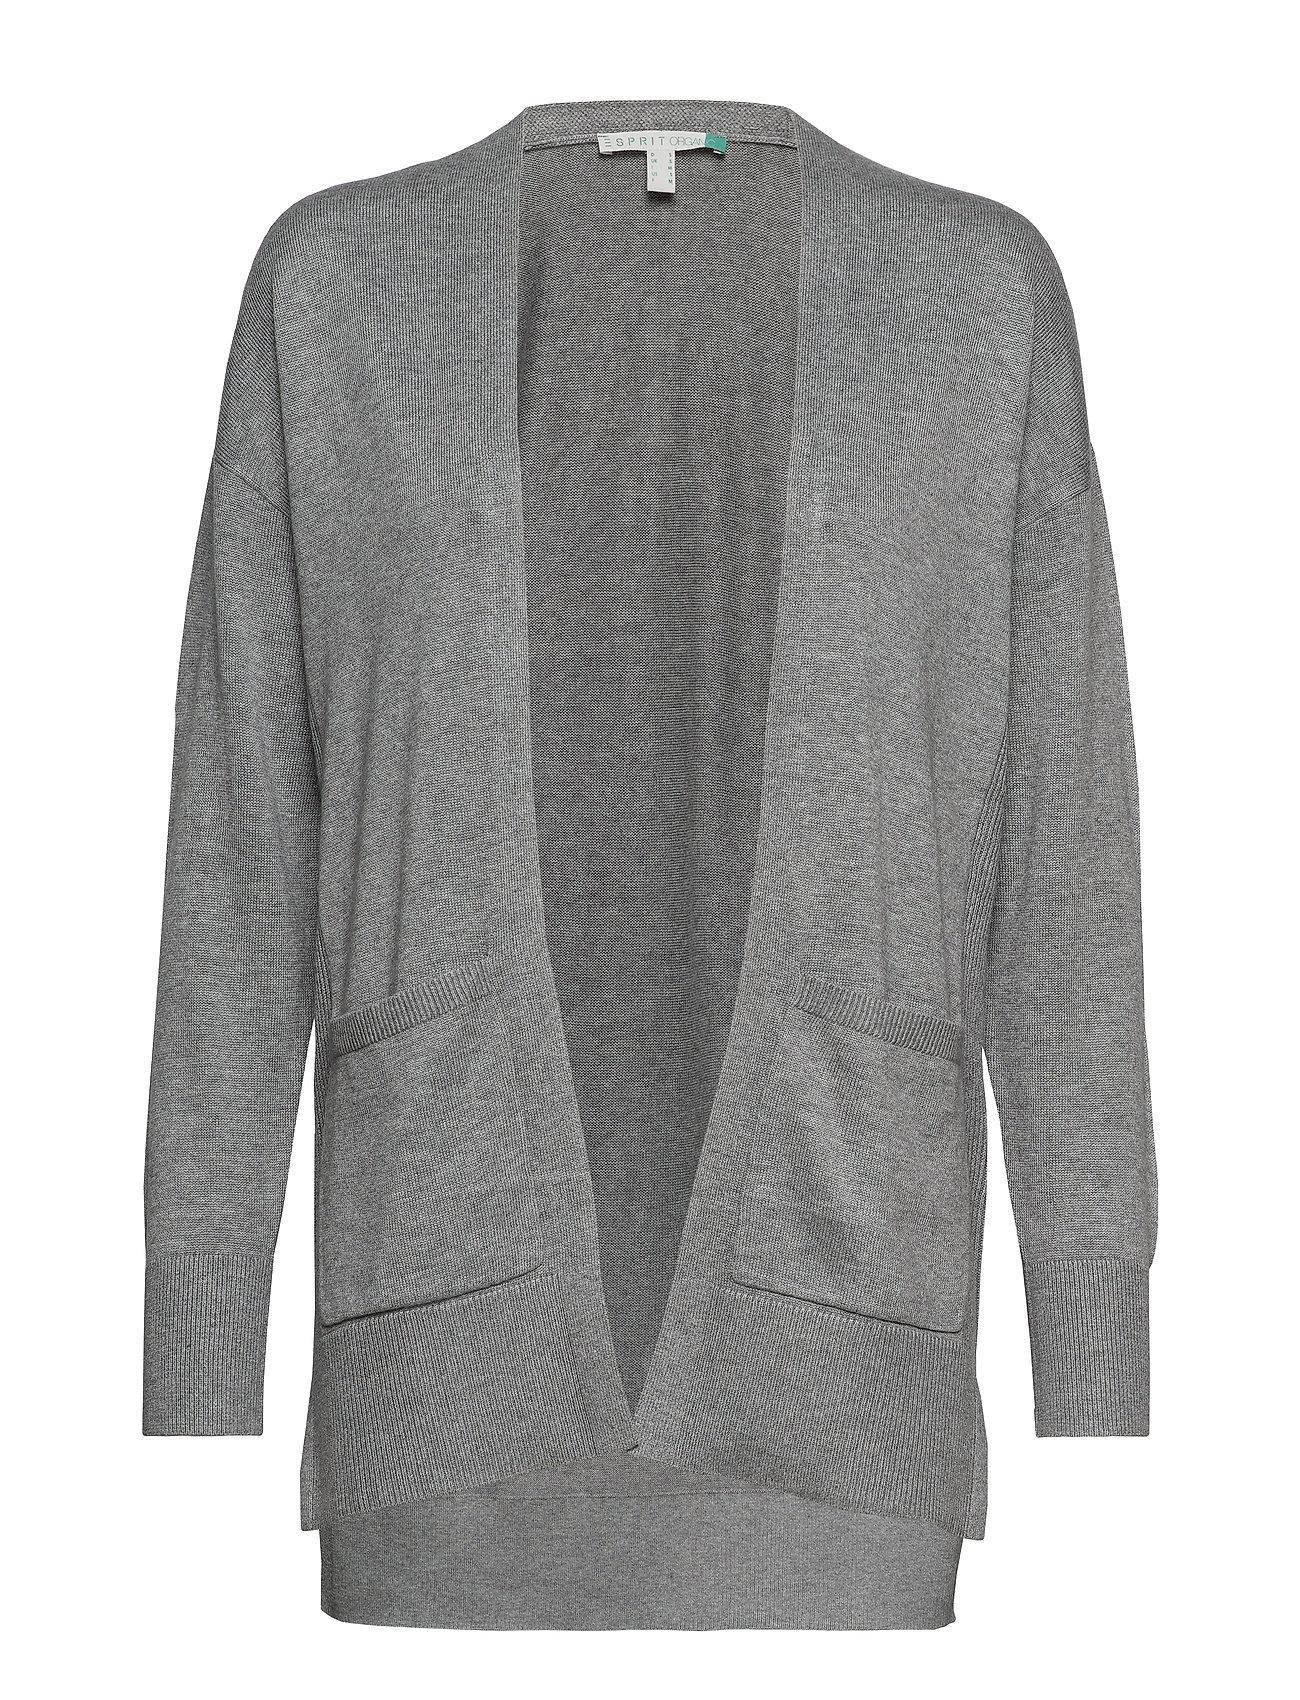 Esprit Casual Sweaters cardigan - GUNMETAL 5